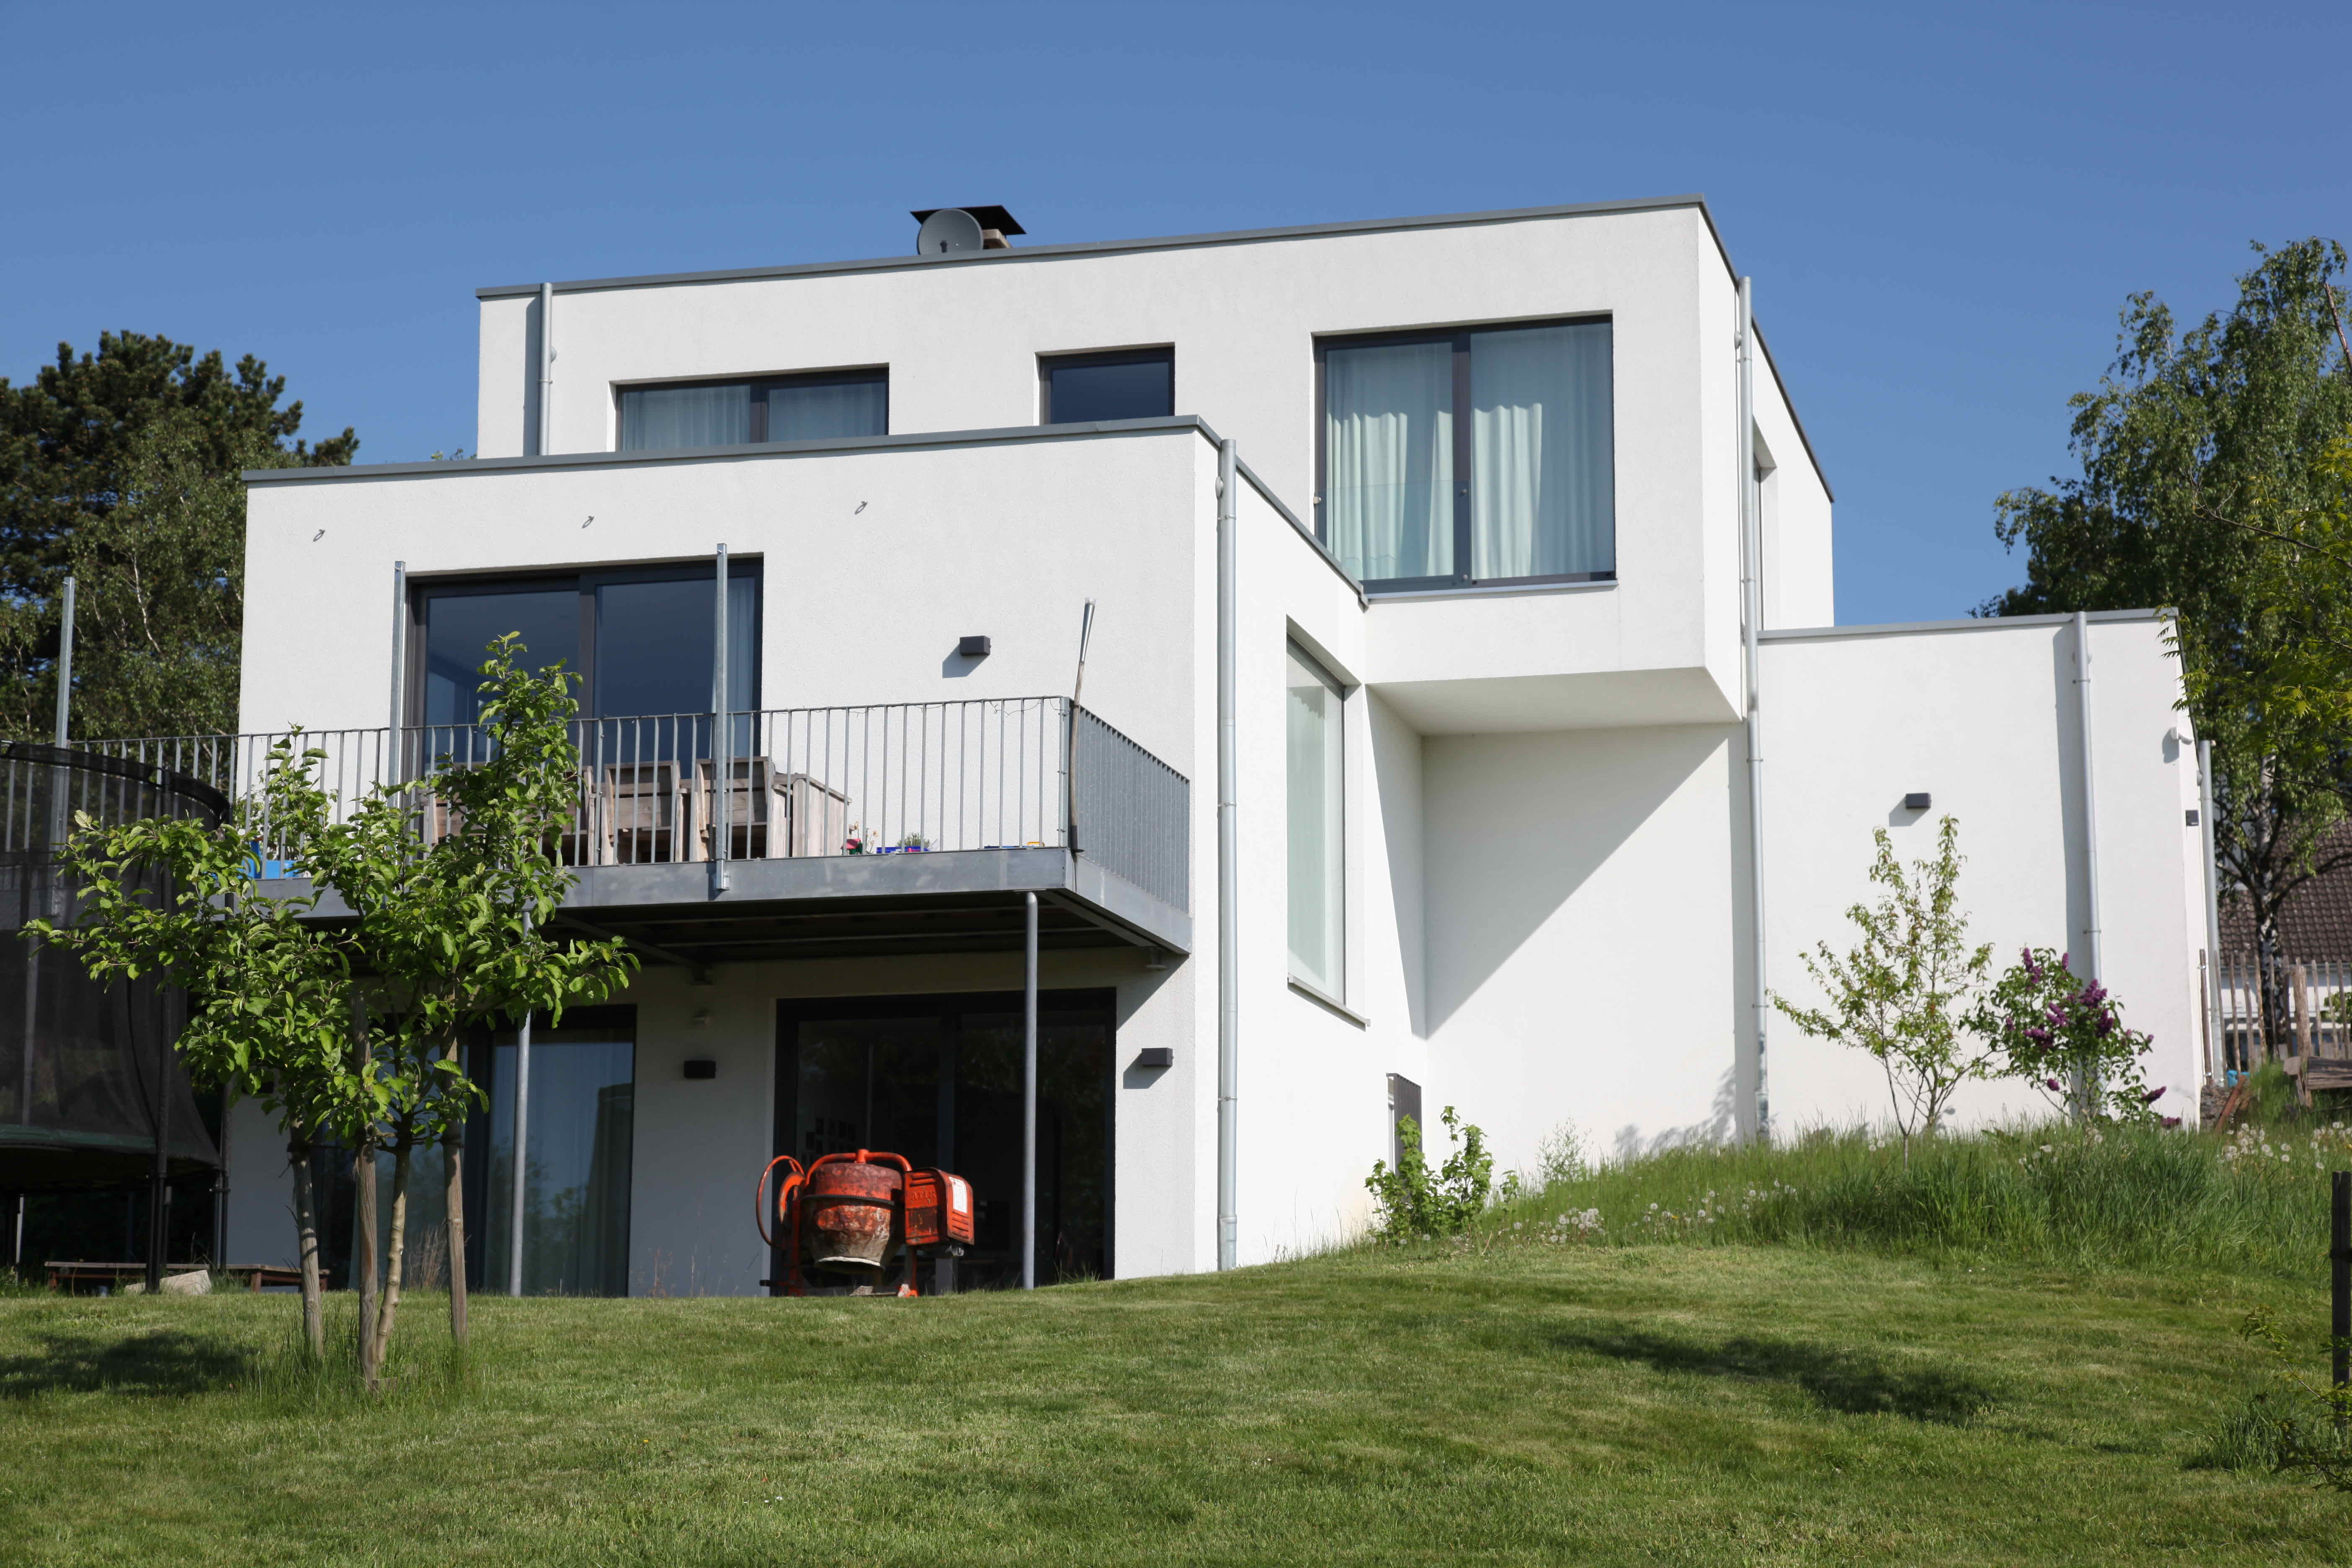 http://architektur-anders.de/wp-content/uploads/2018/06/IMG_7492.jpg